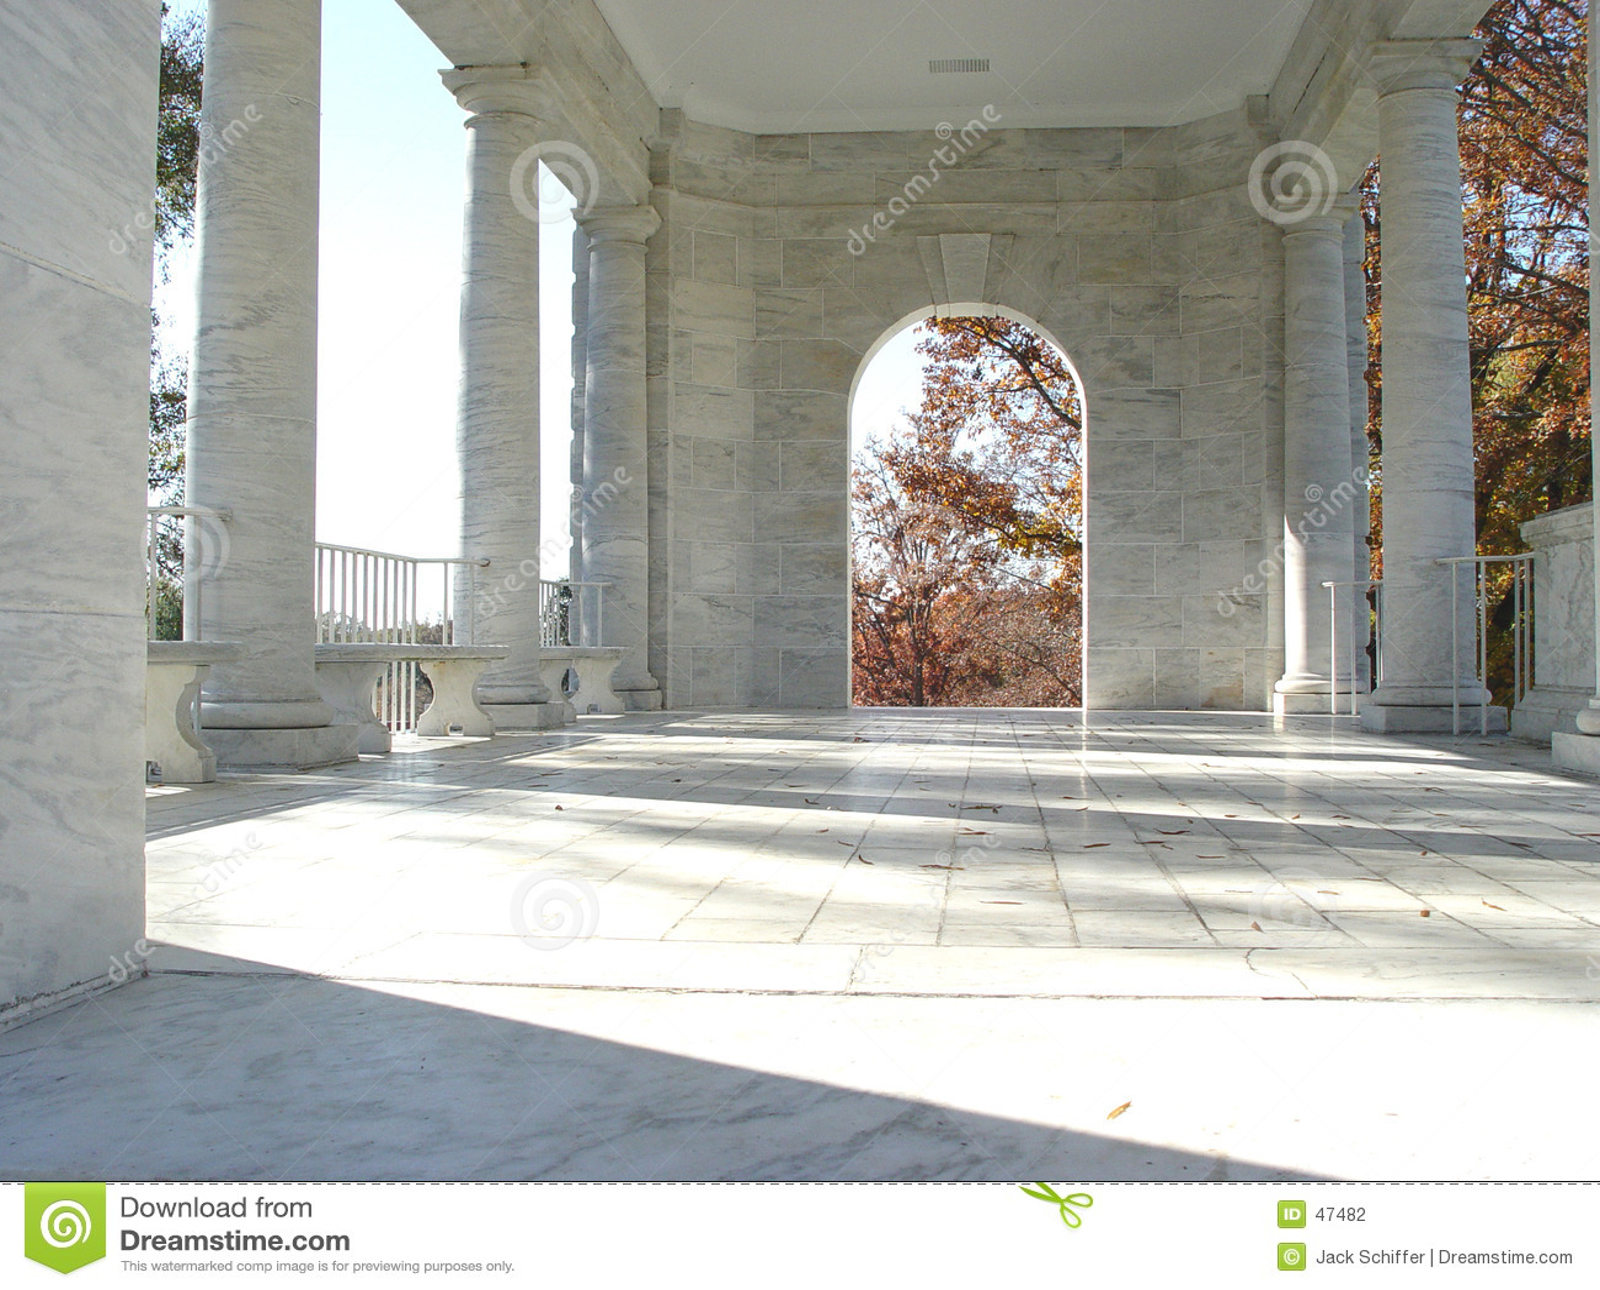 Download 心房 库存照片. 图片 包括有 柱子, 空白, 大理石, 经典, 影子, 墓地, 纪念 - 47482